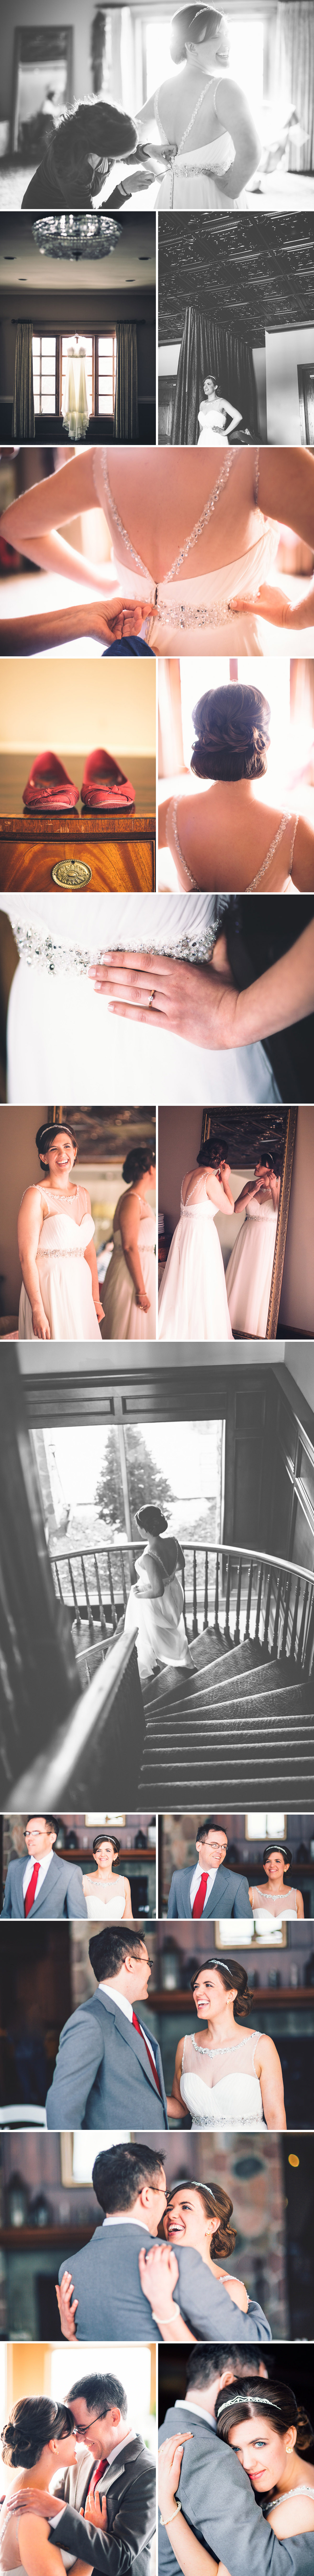 Chicago_Fine_Art_Wedding_Photography_coffman1.jpg